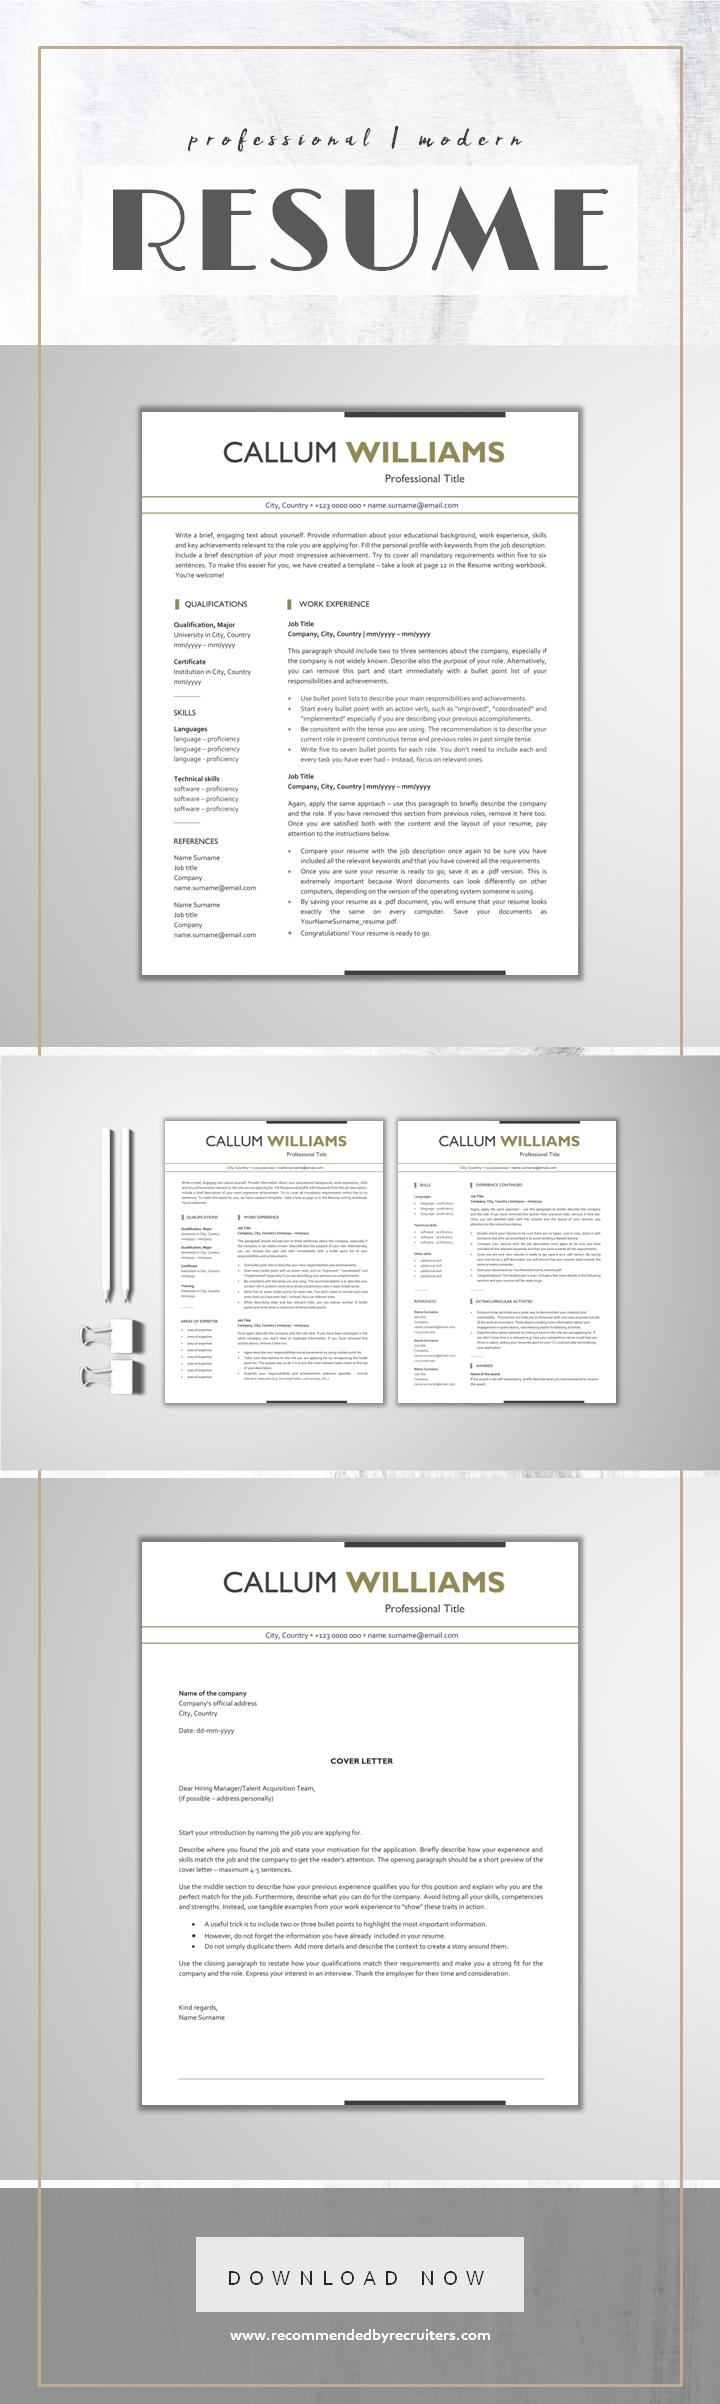 250f4b3867ca7d2c58c01328ec154720 Template Cover Letter Design Free Black Professional Resume Fondul on